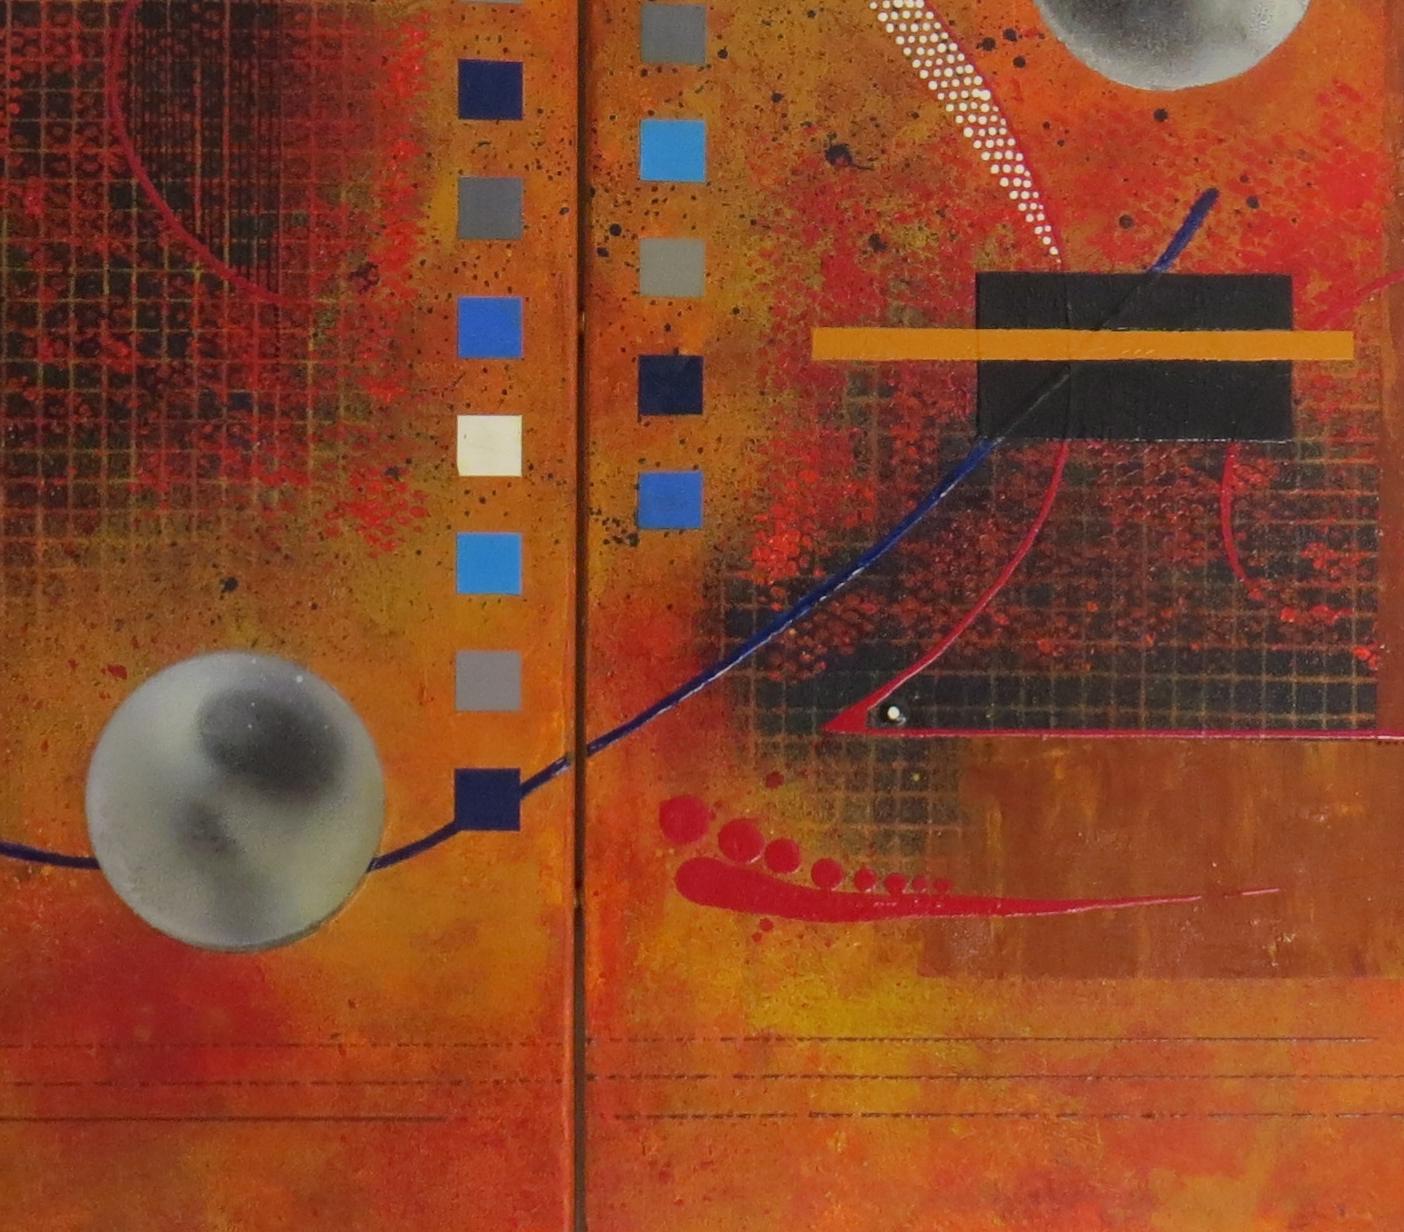 dzëta - vue zoom5 - DALUZ GALEGO - peinture abstraite